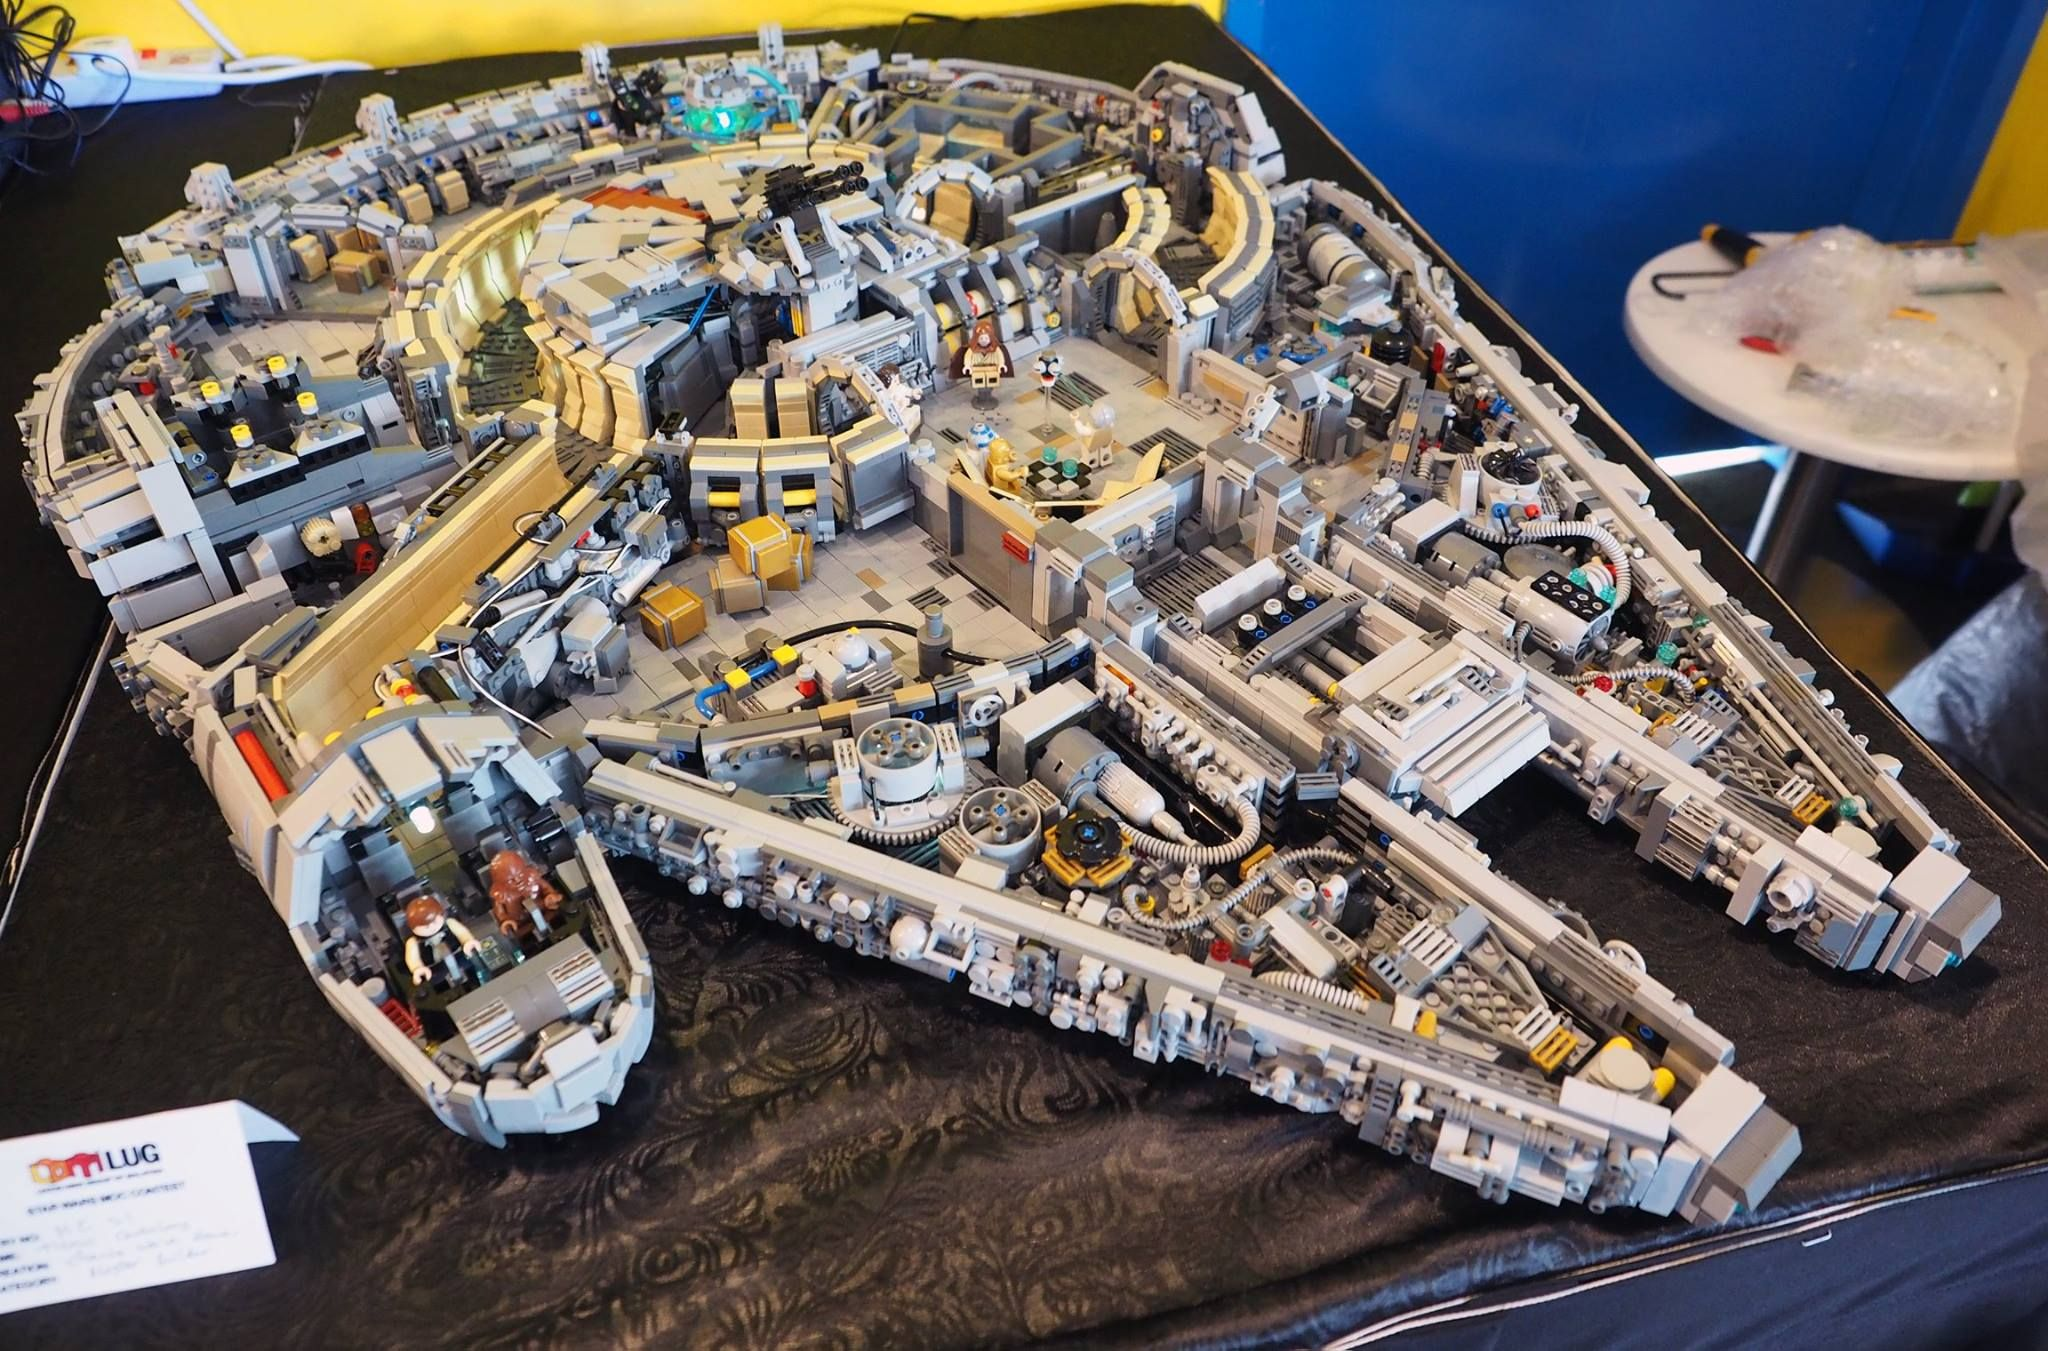 Lego Like Toys : Lego millennium falcon blerds geeks nerds comics